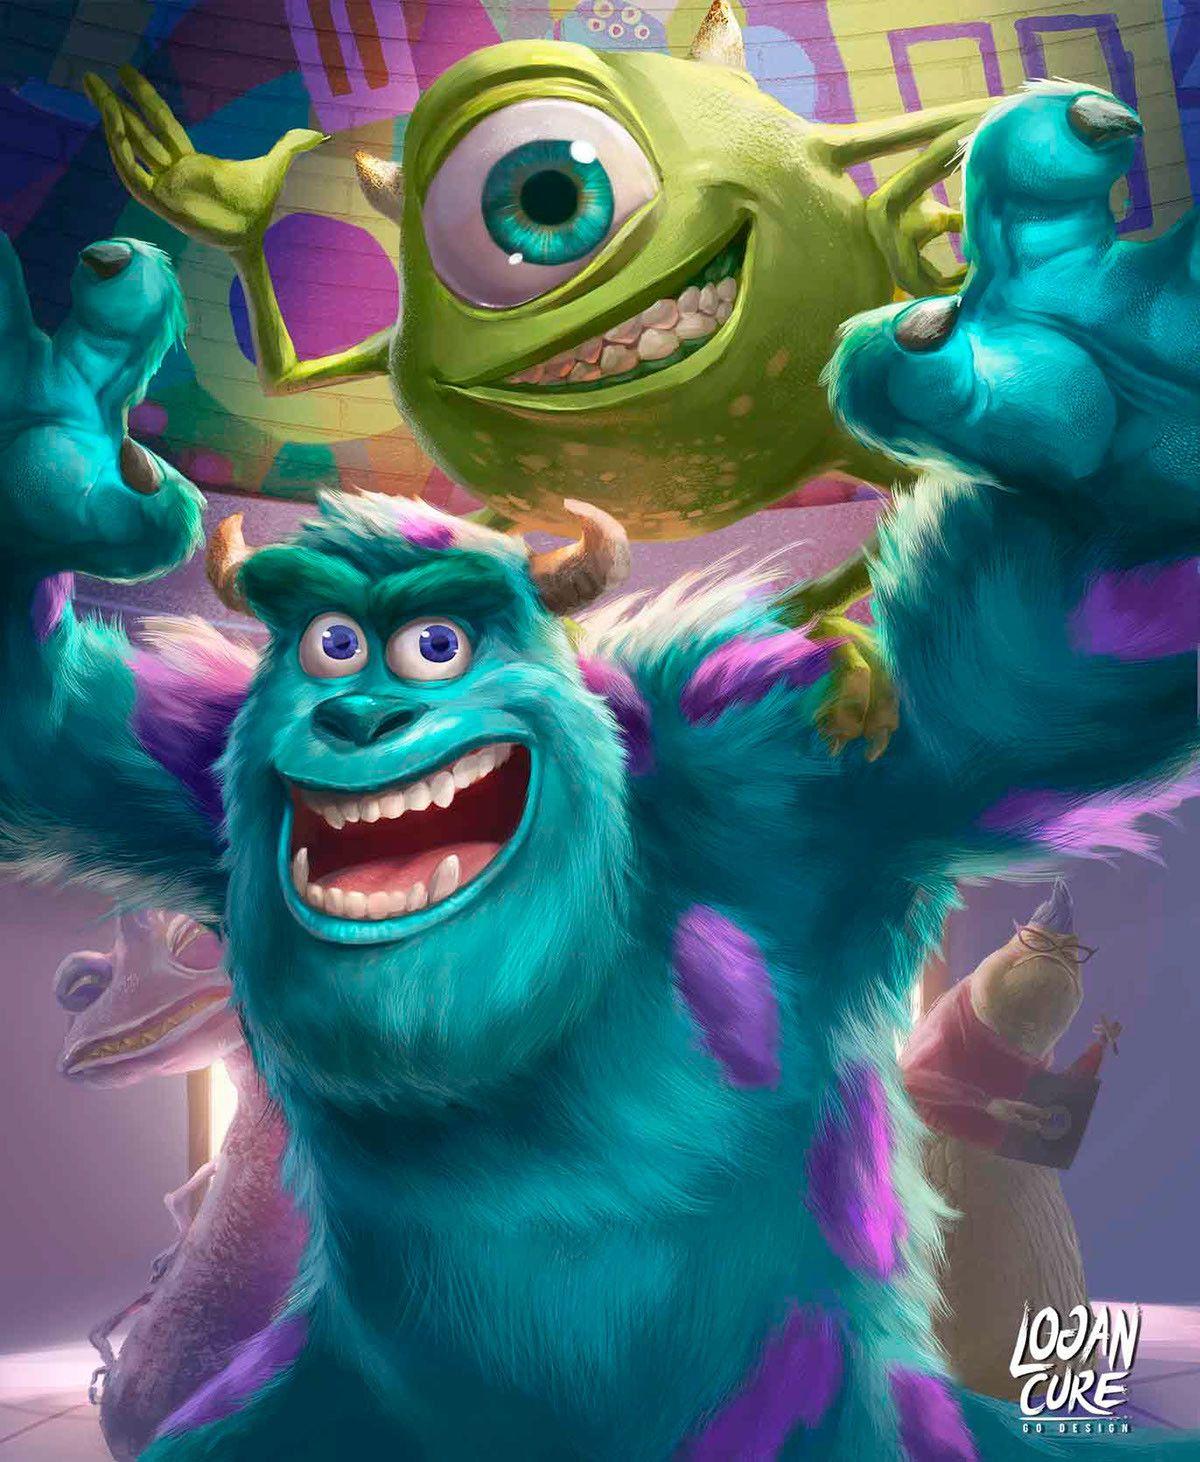 Artstation Monsters Inc Mike An Sullivan Logan Cure Disney